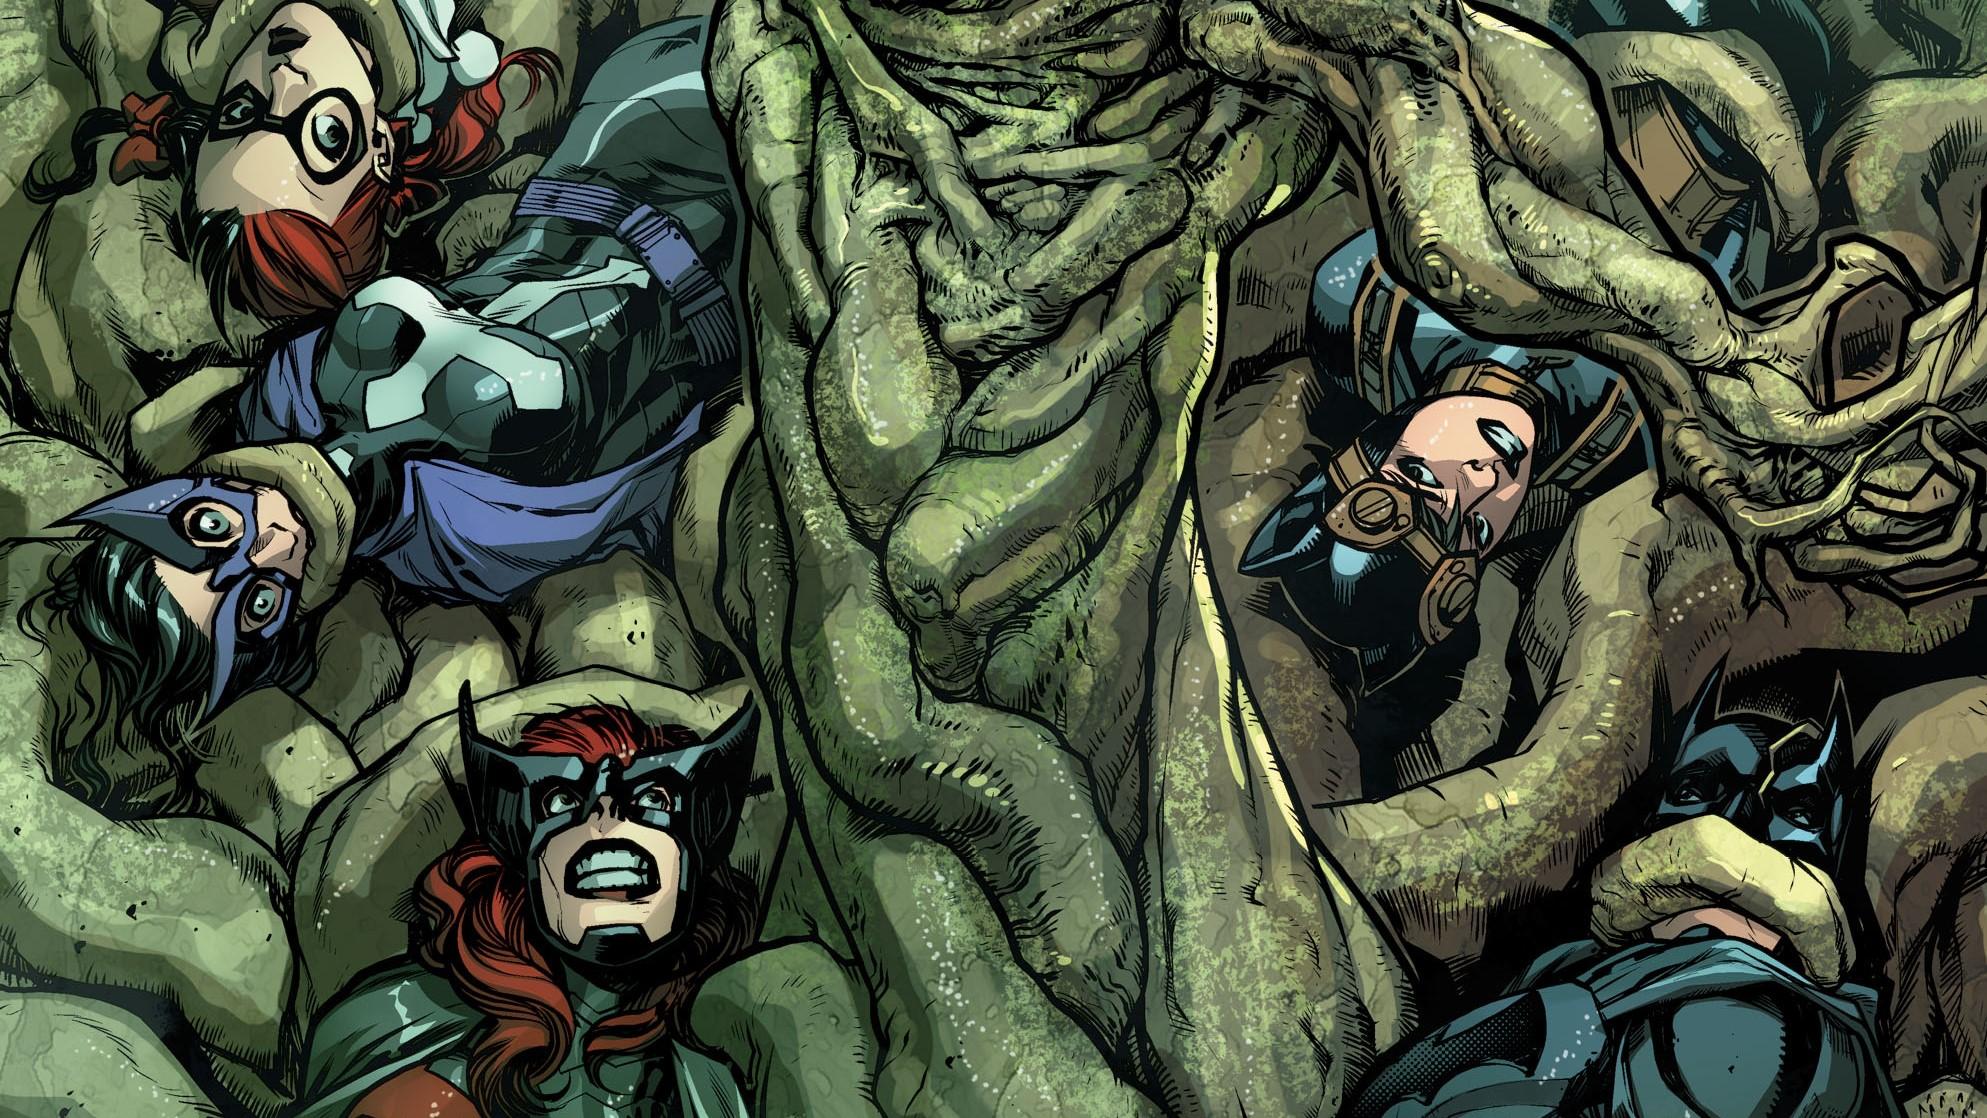 Anime 1987x1118 Injustice 2 DC Comics DC Universe Harley Quinn Huntress Catwoman Batman Batwoman